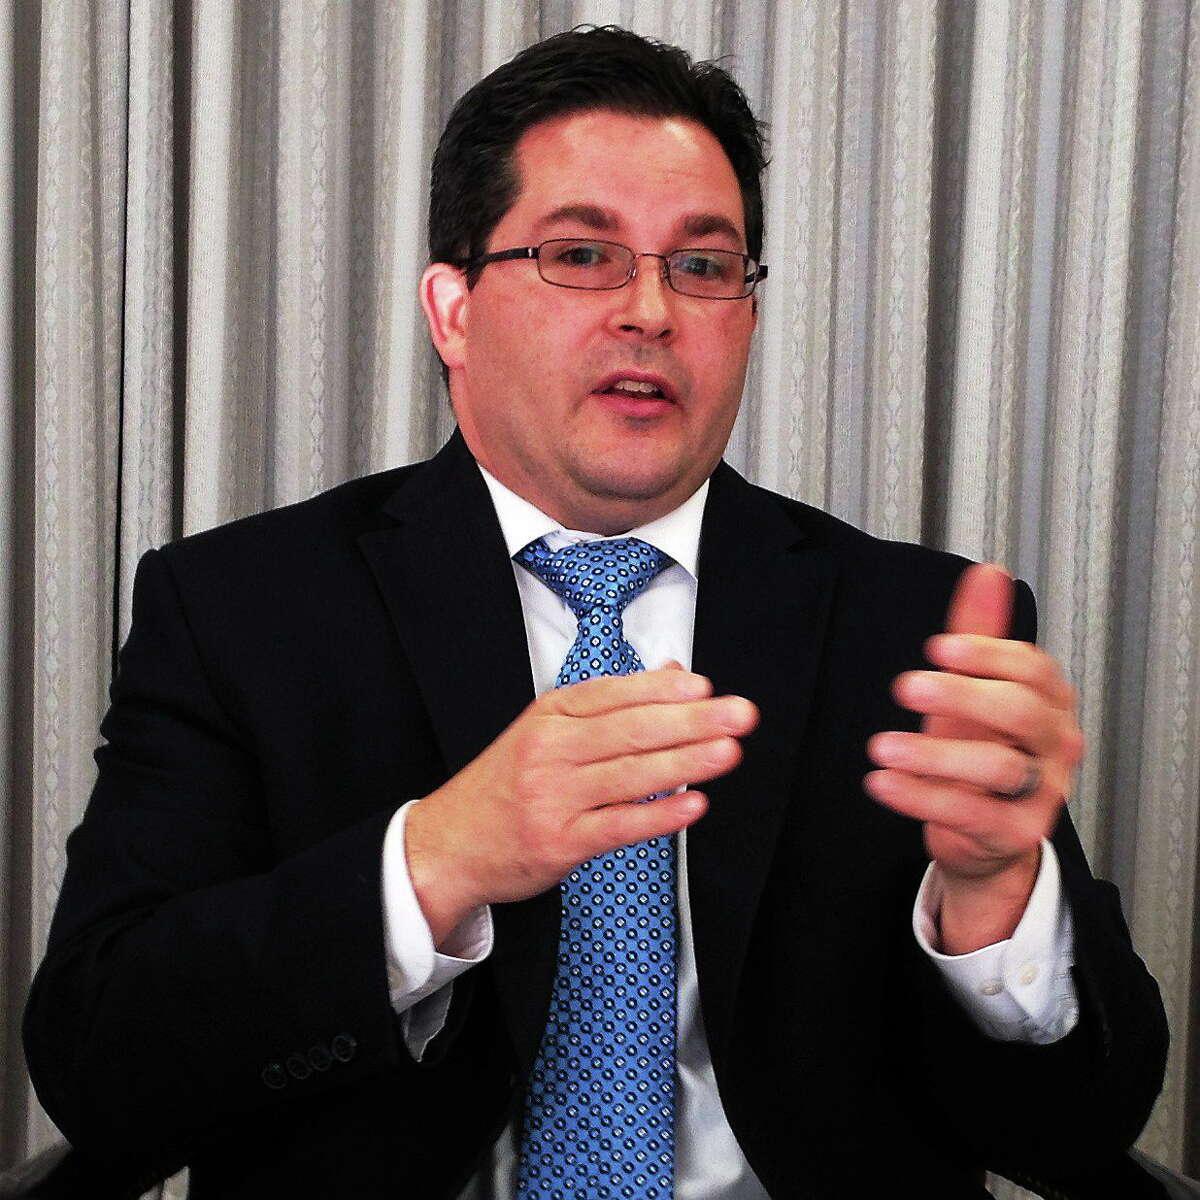 Jeffrey Villar